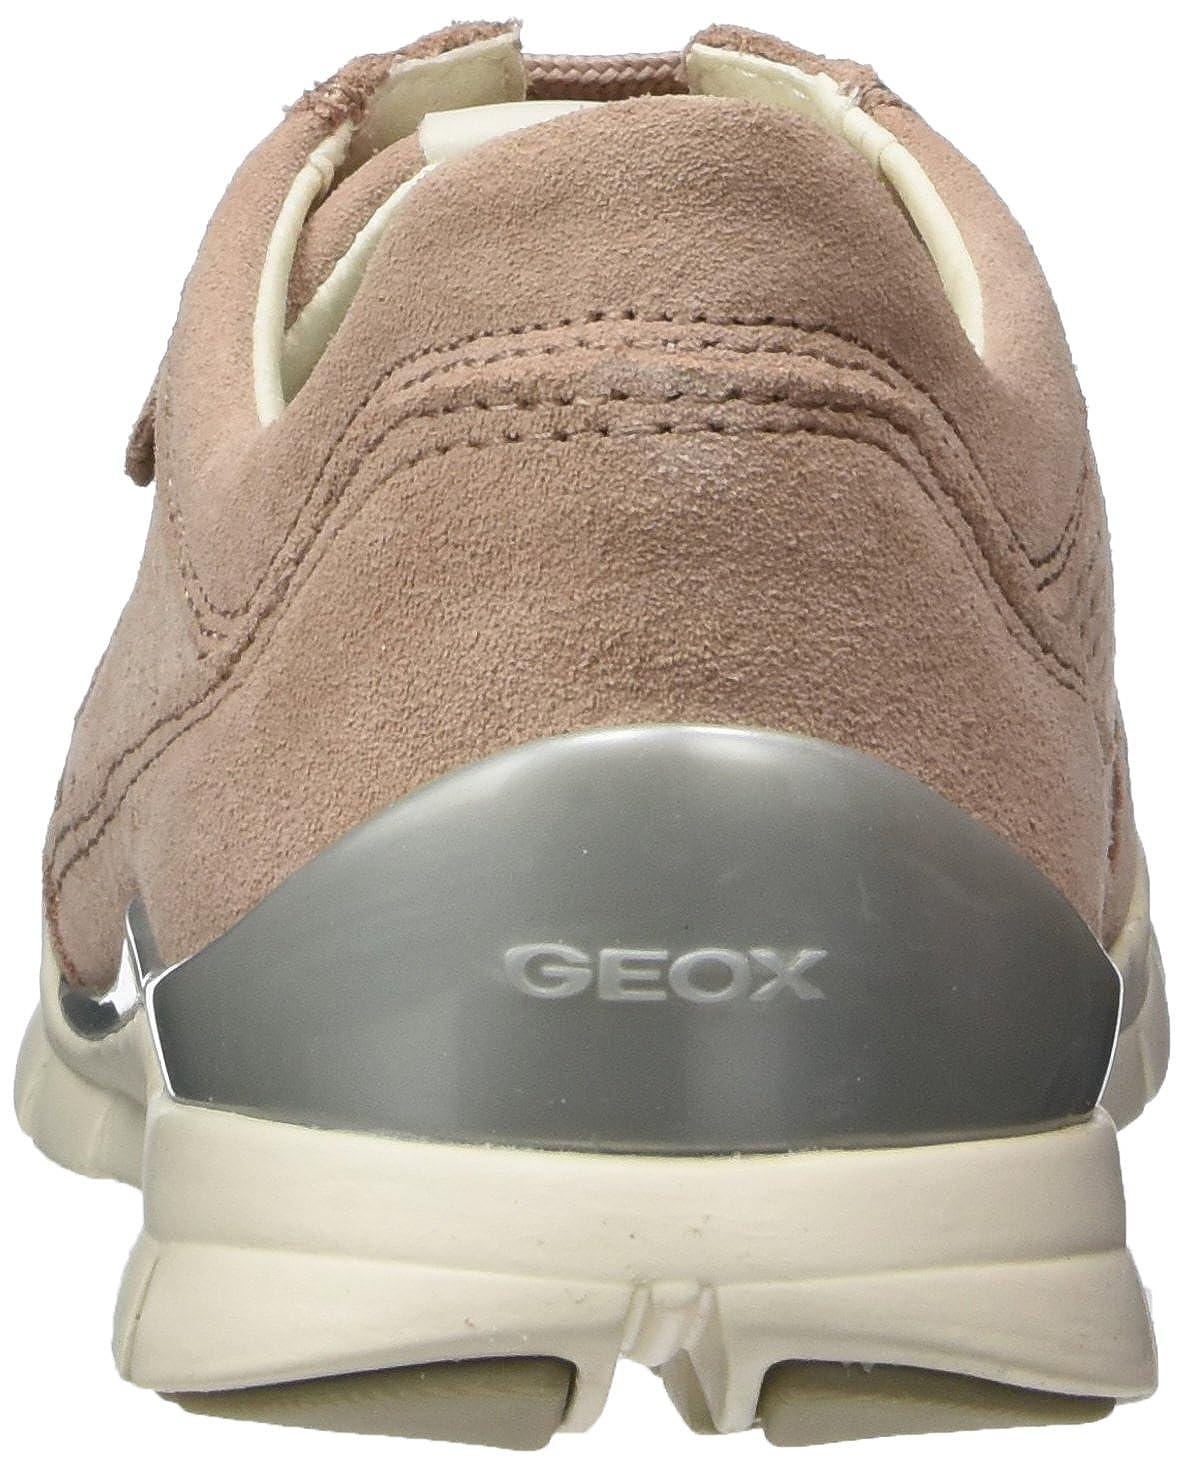 Geox Women/'s D Sukie F Trainers